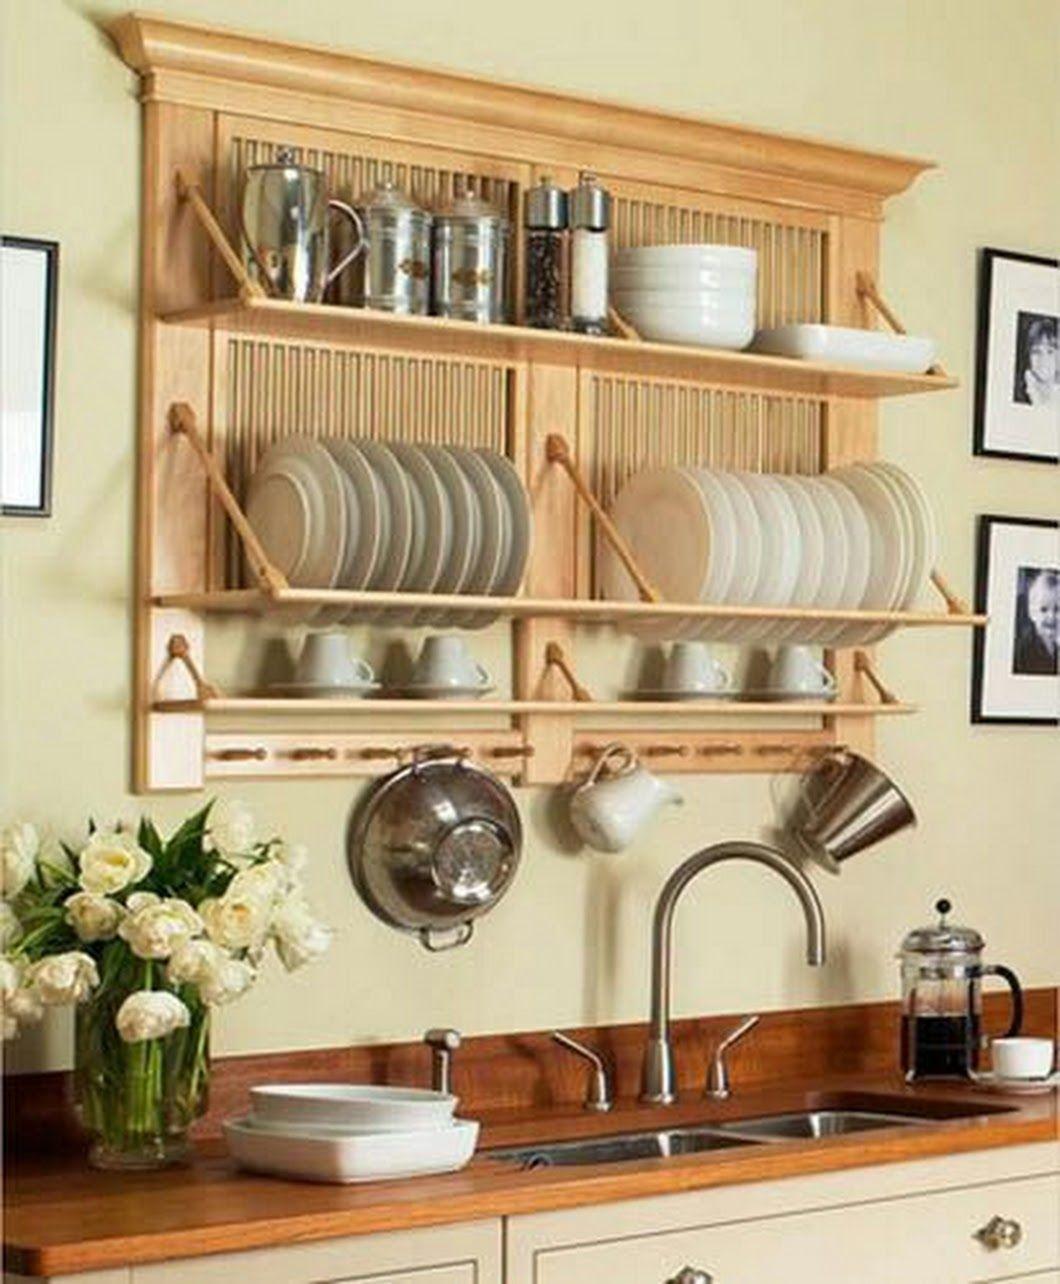 Pake jendela lawas is part of Kitchen rack -